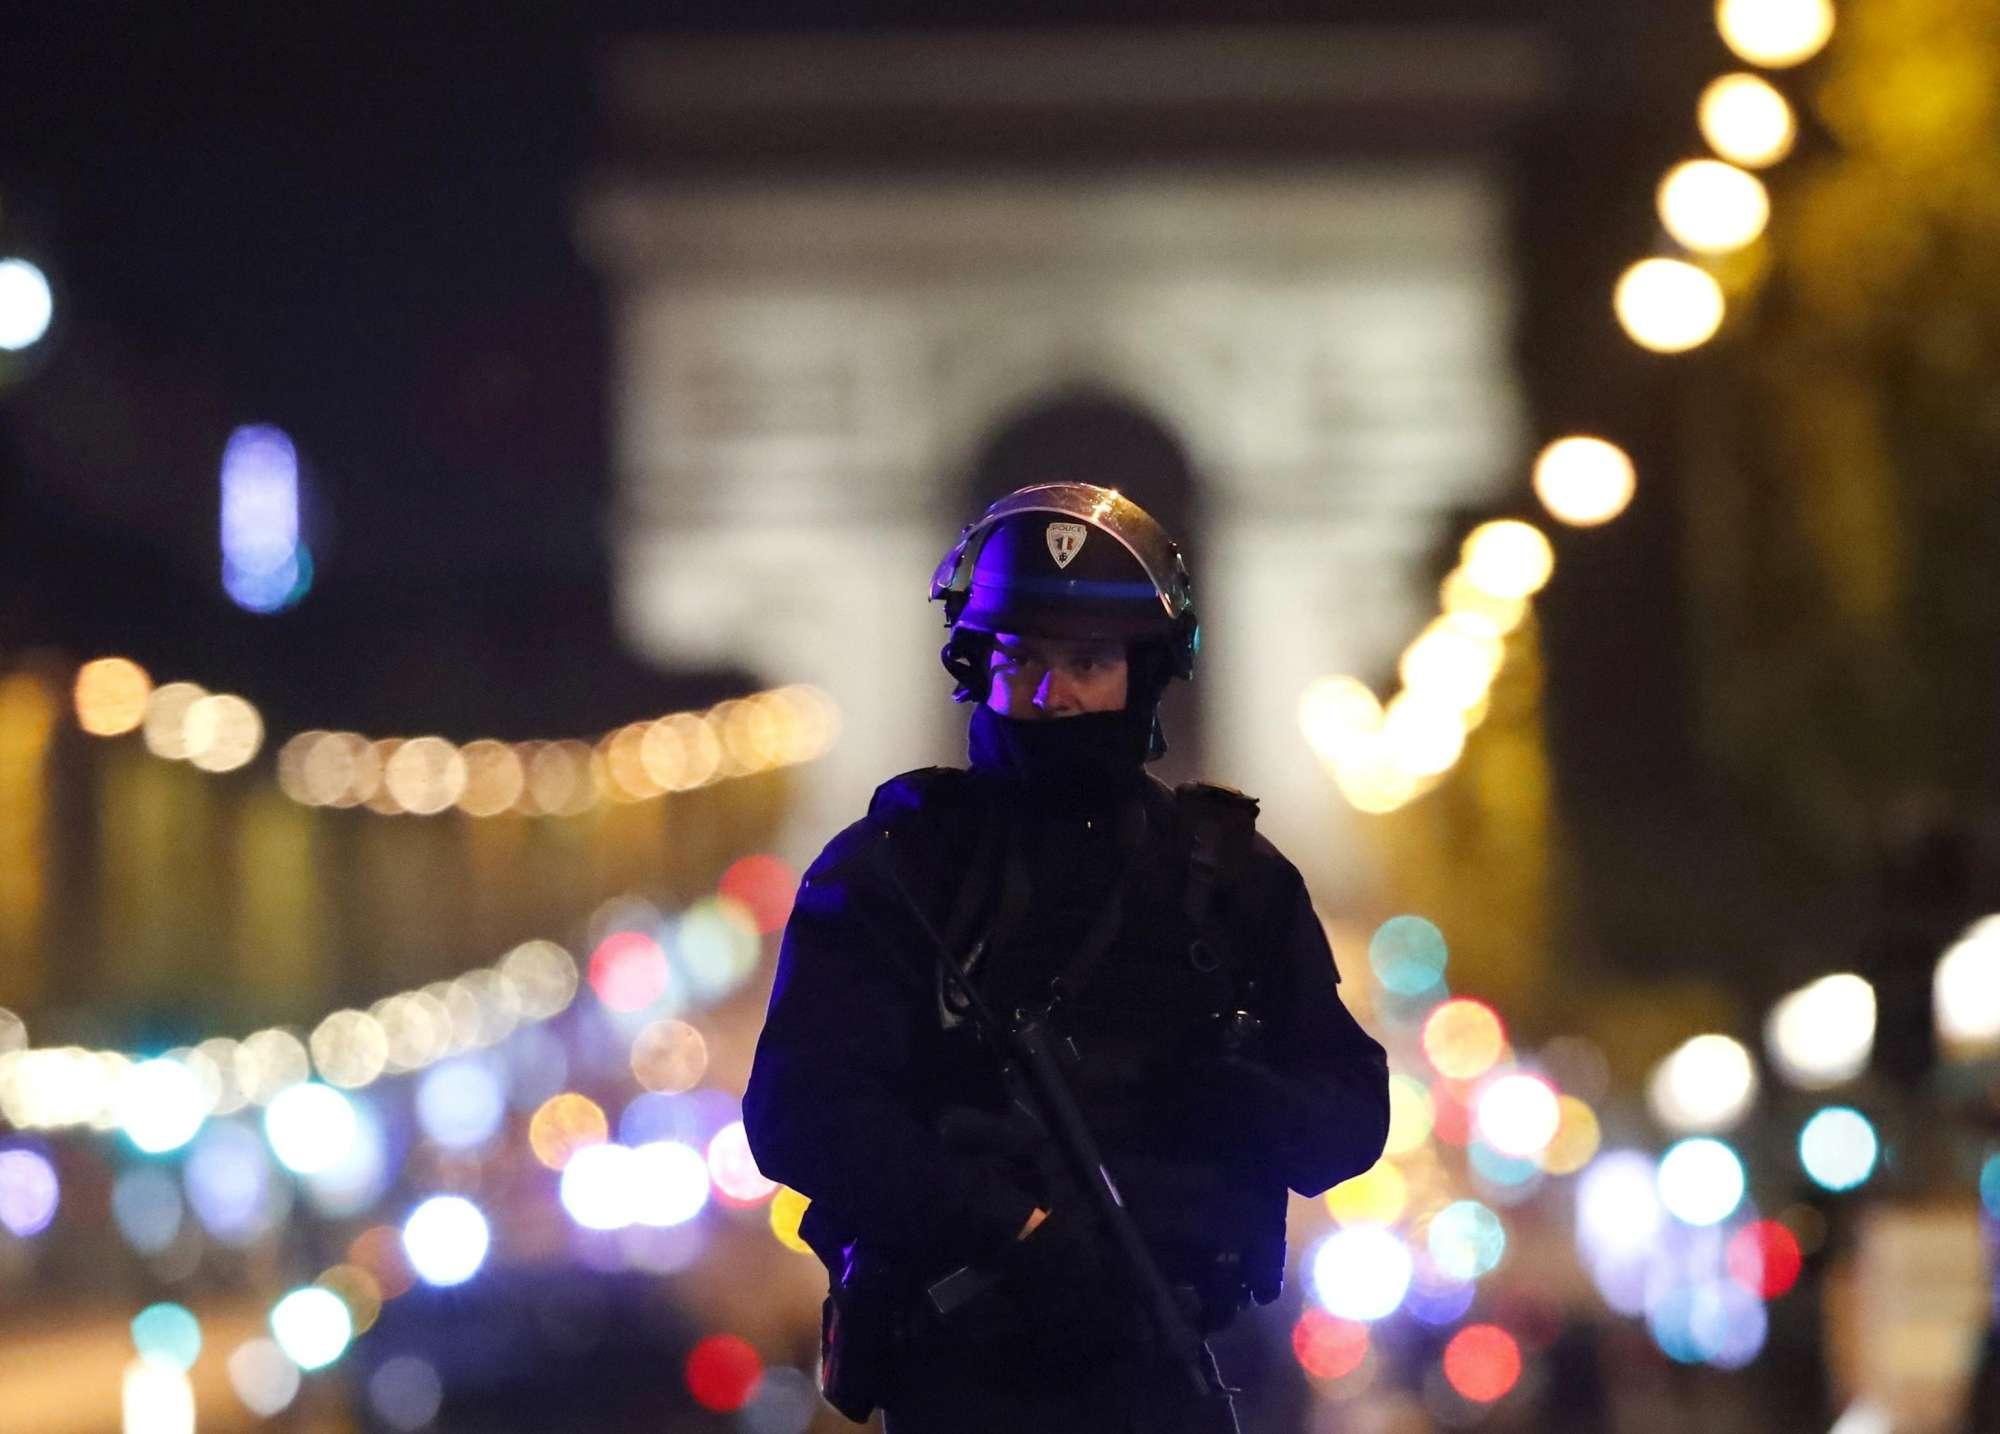 Sparatoria sugli Champs-Elysées, Hollande: è terrorismo